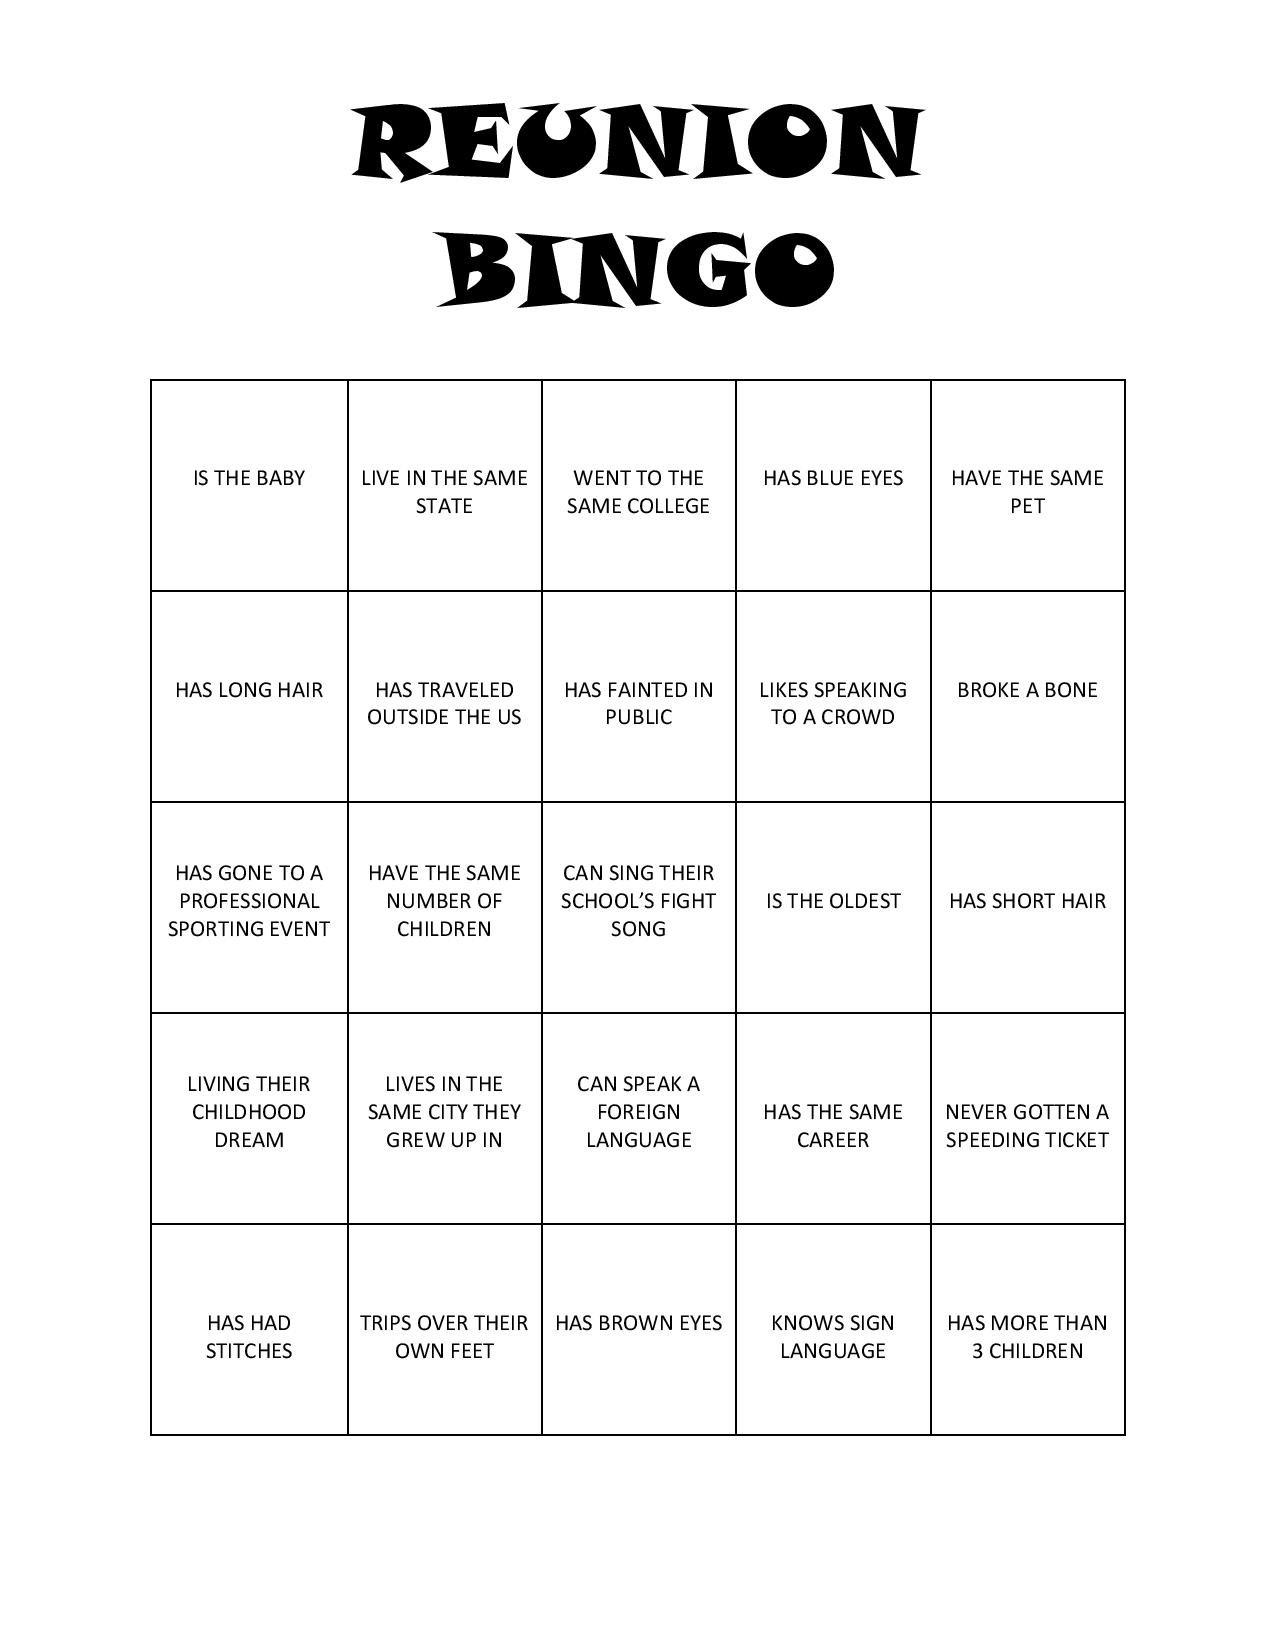 10 Trendy Family Reunion Games And Ideas reunion bingo free printable 2020